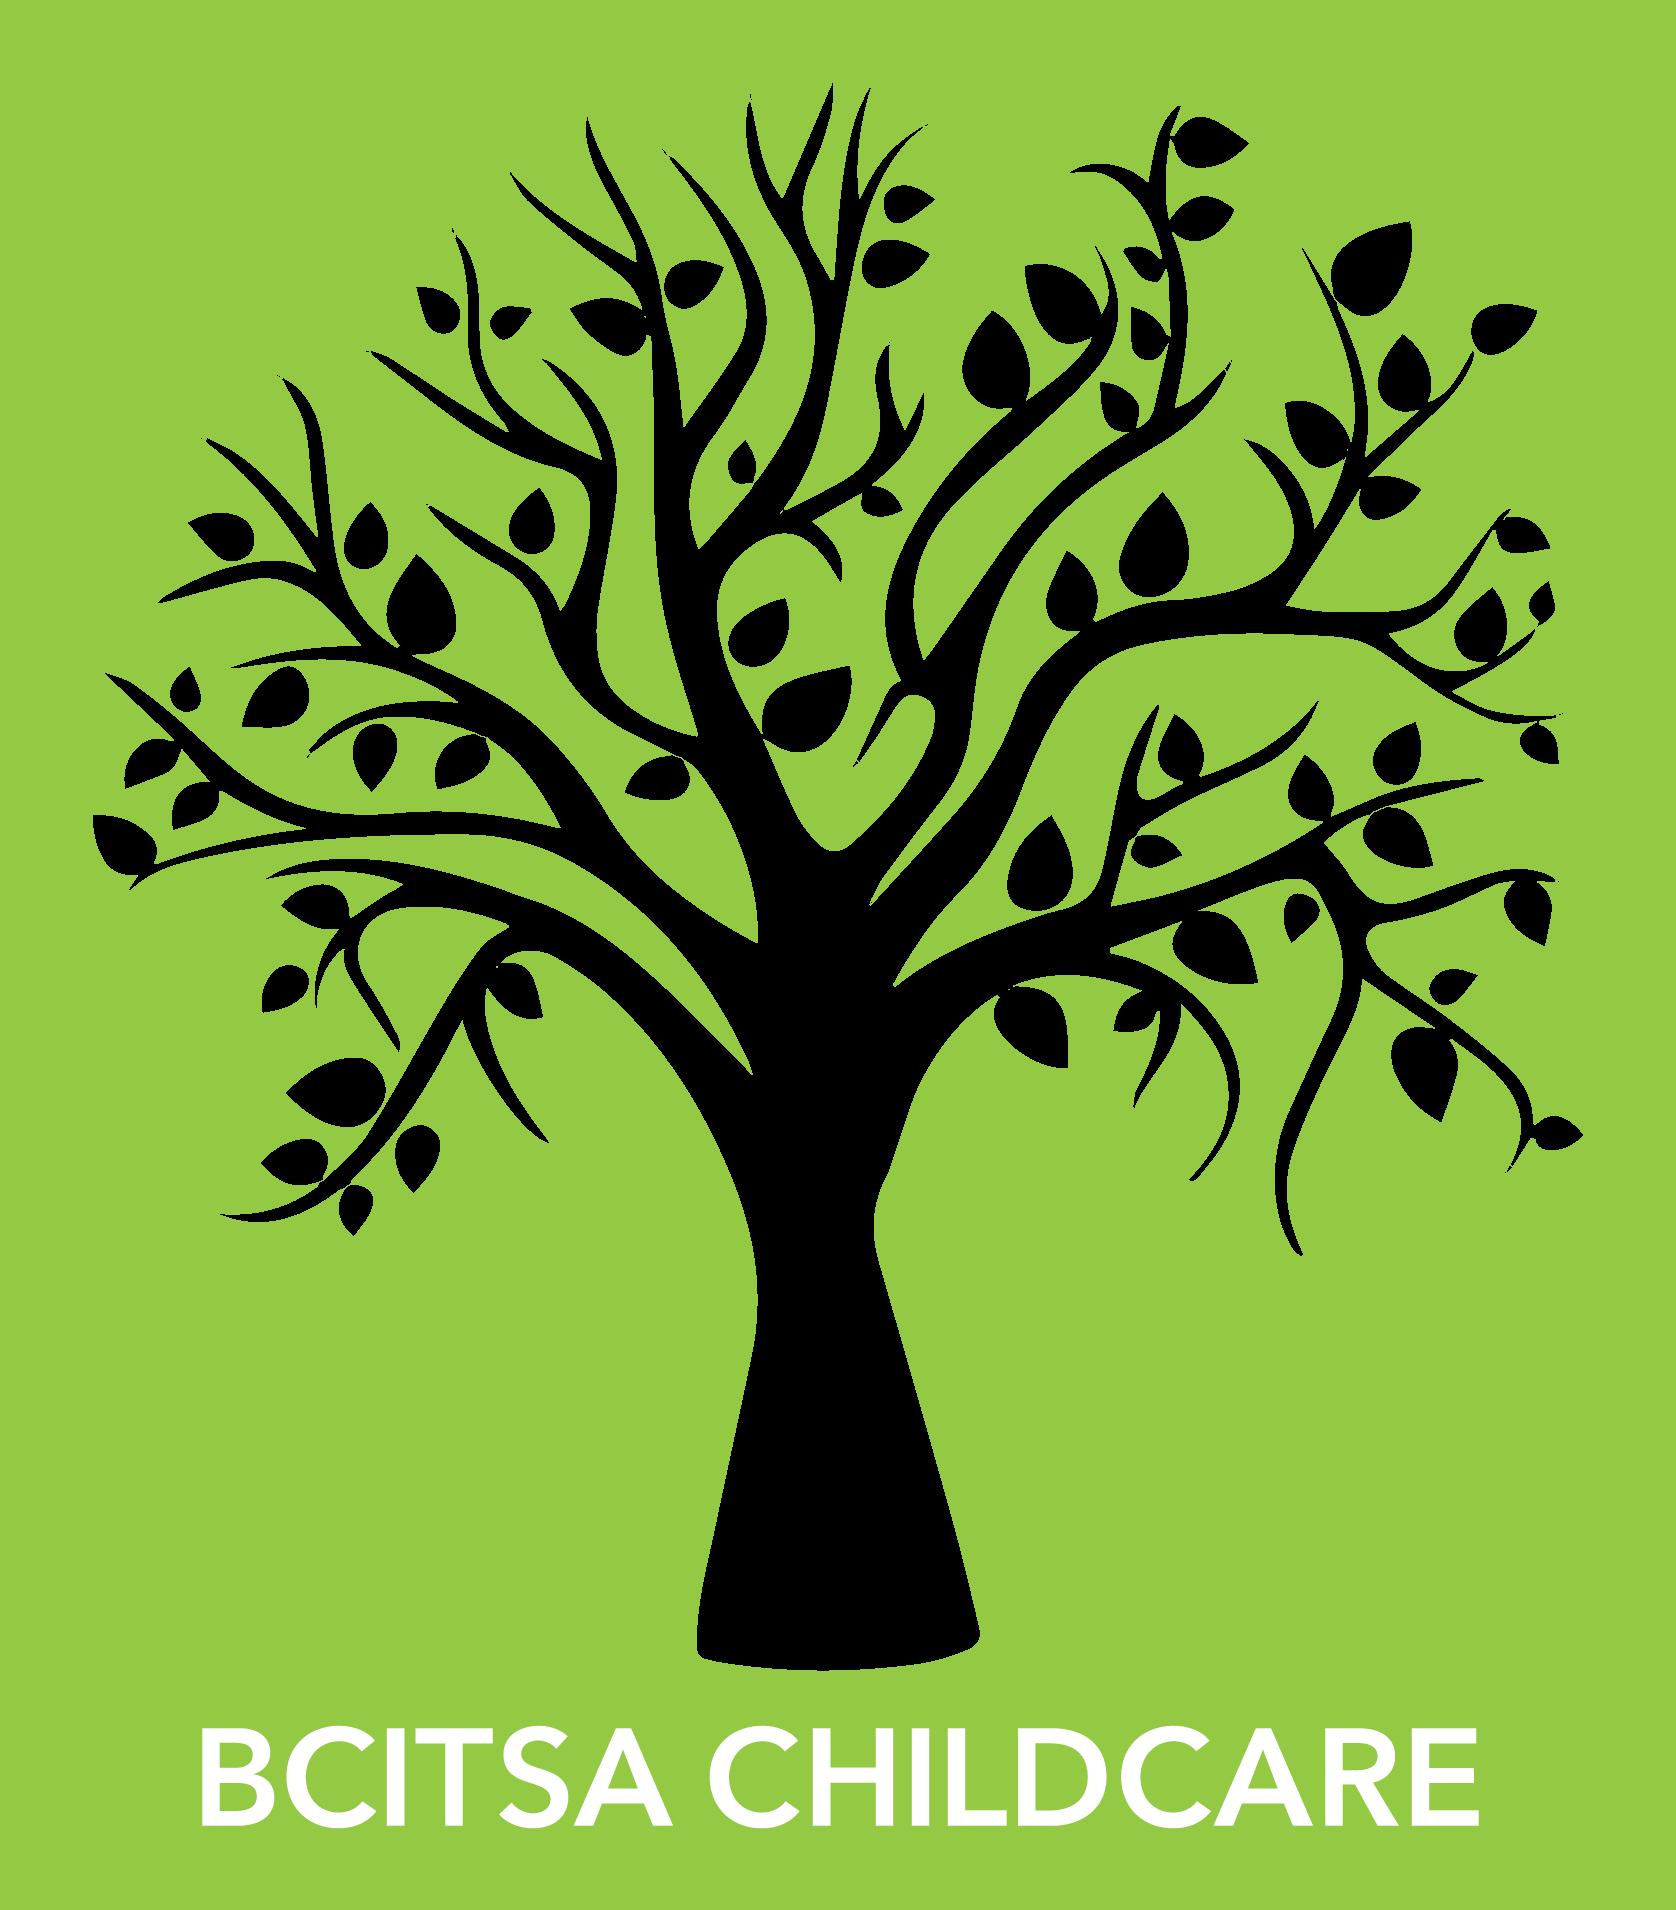 bcitsa childcare logo